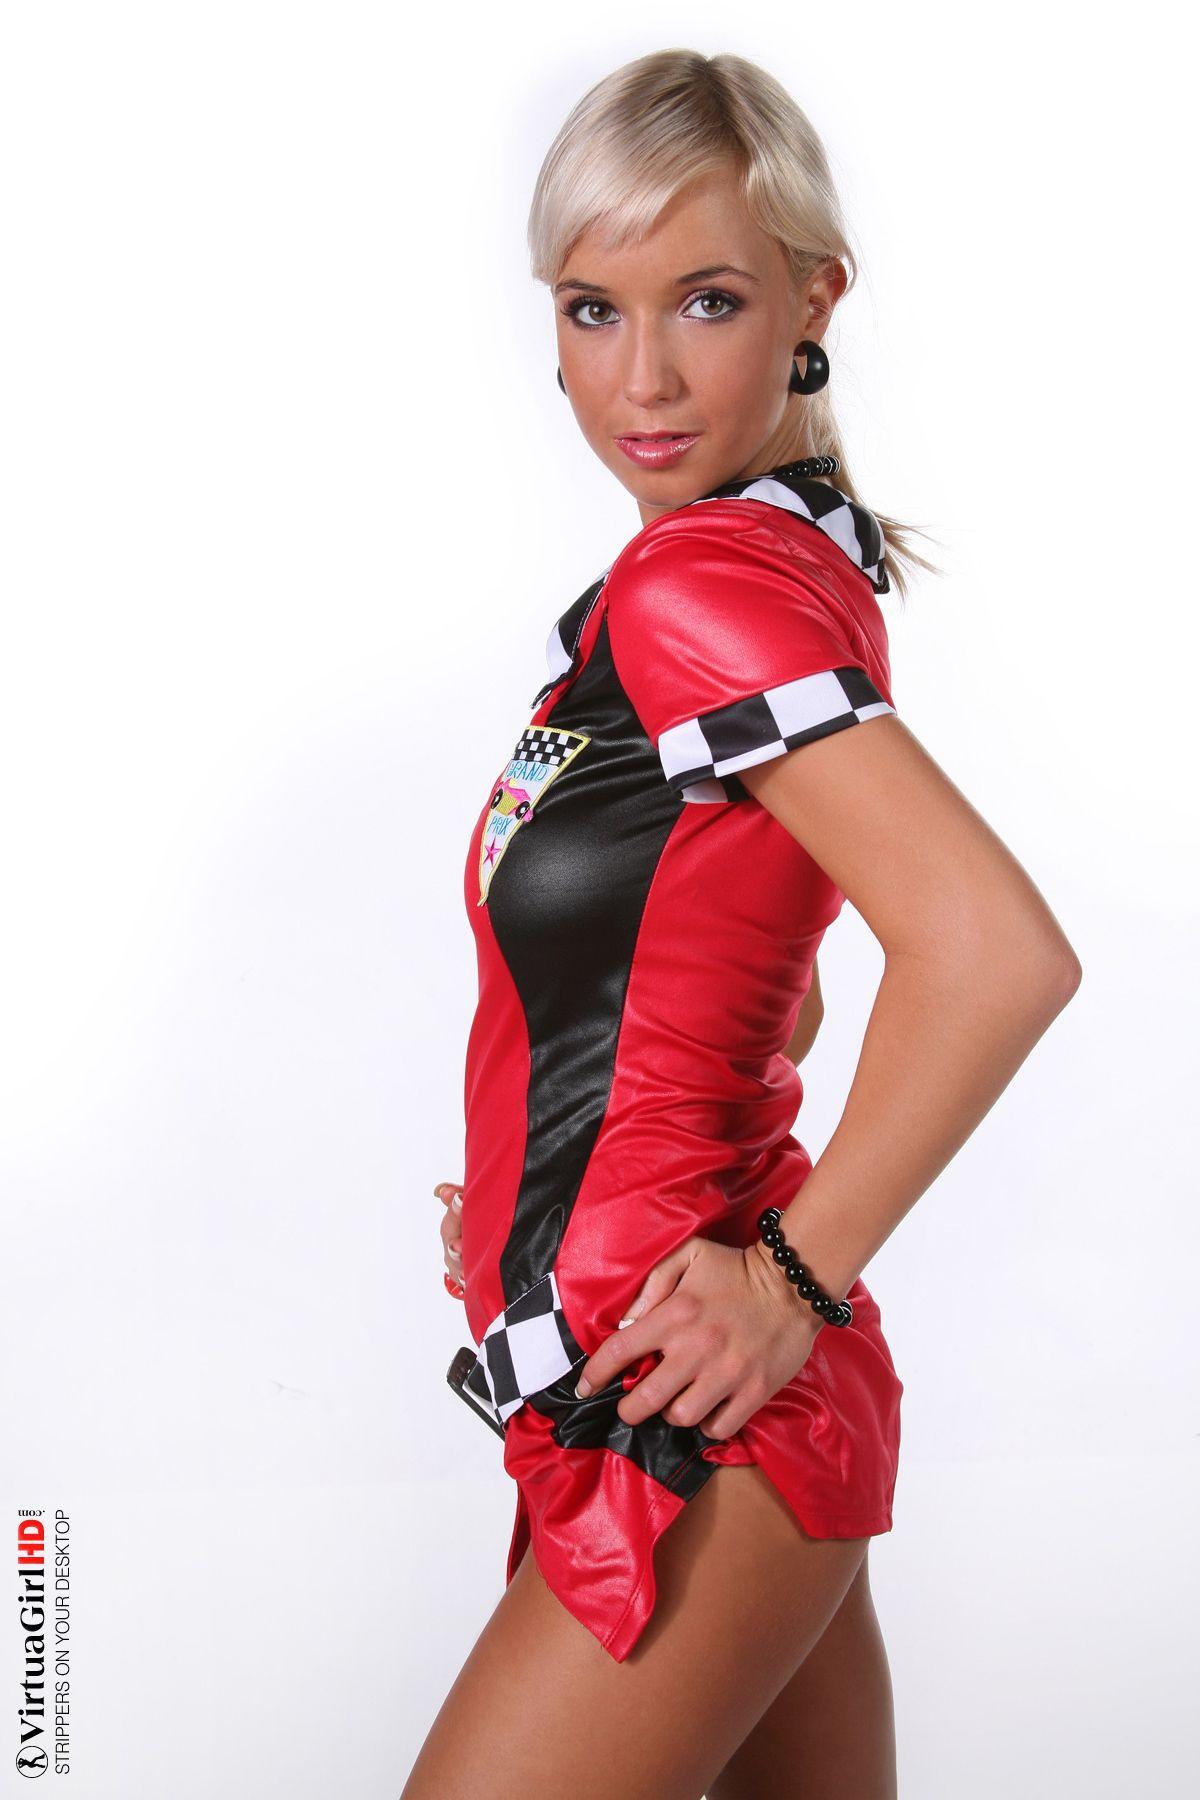 Natali Blond - INDY 500 02